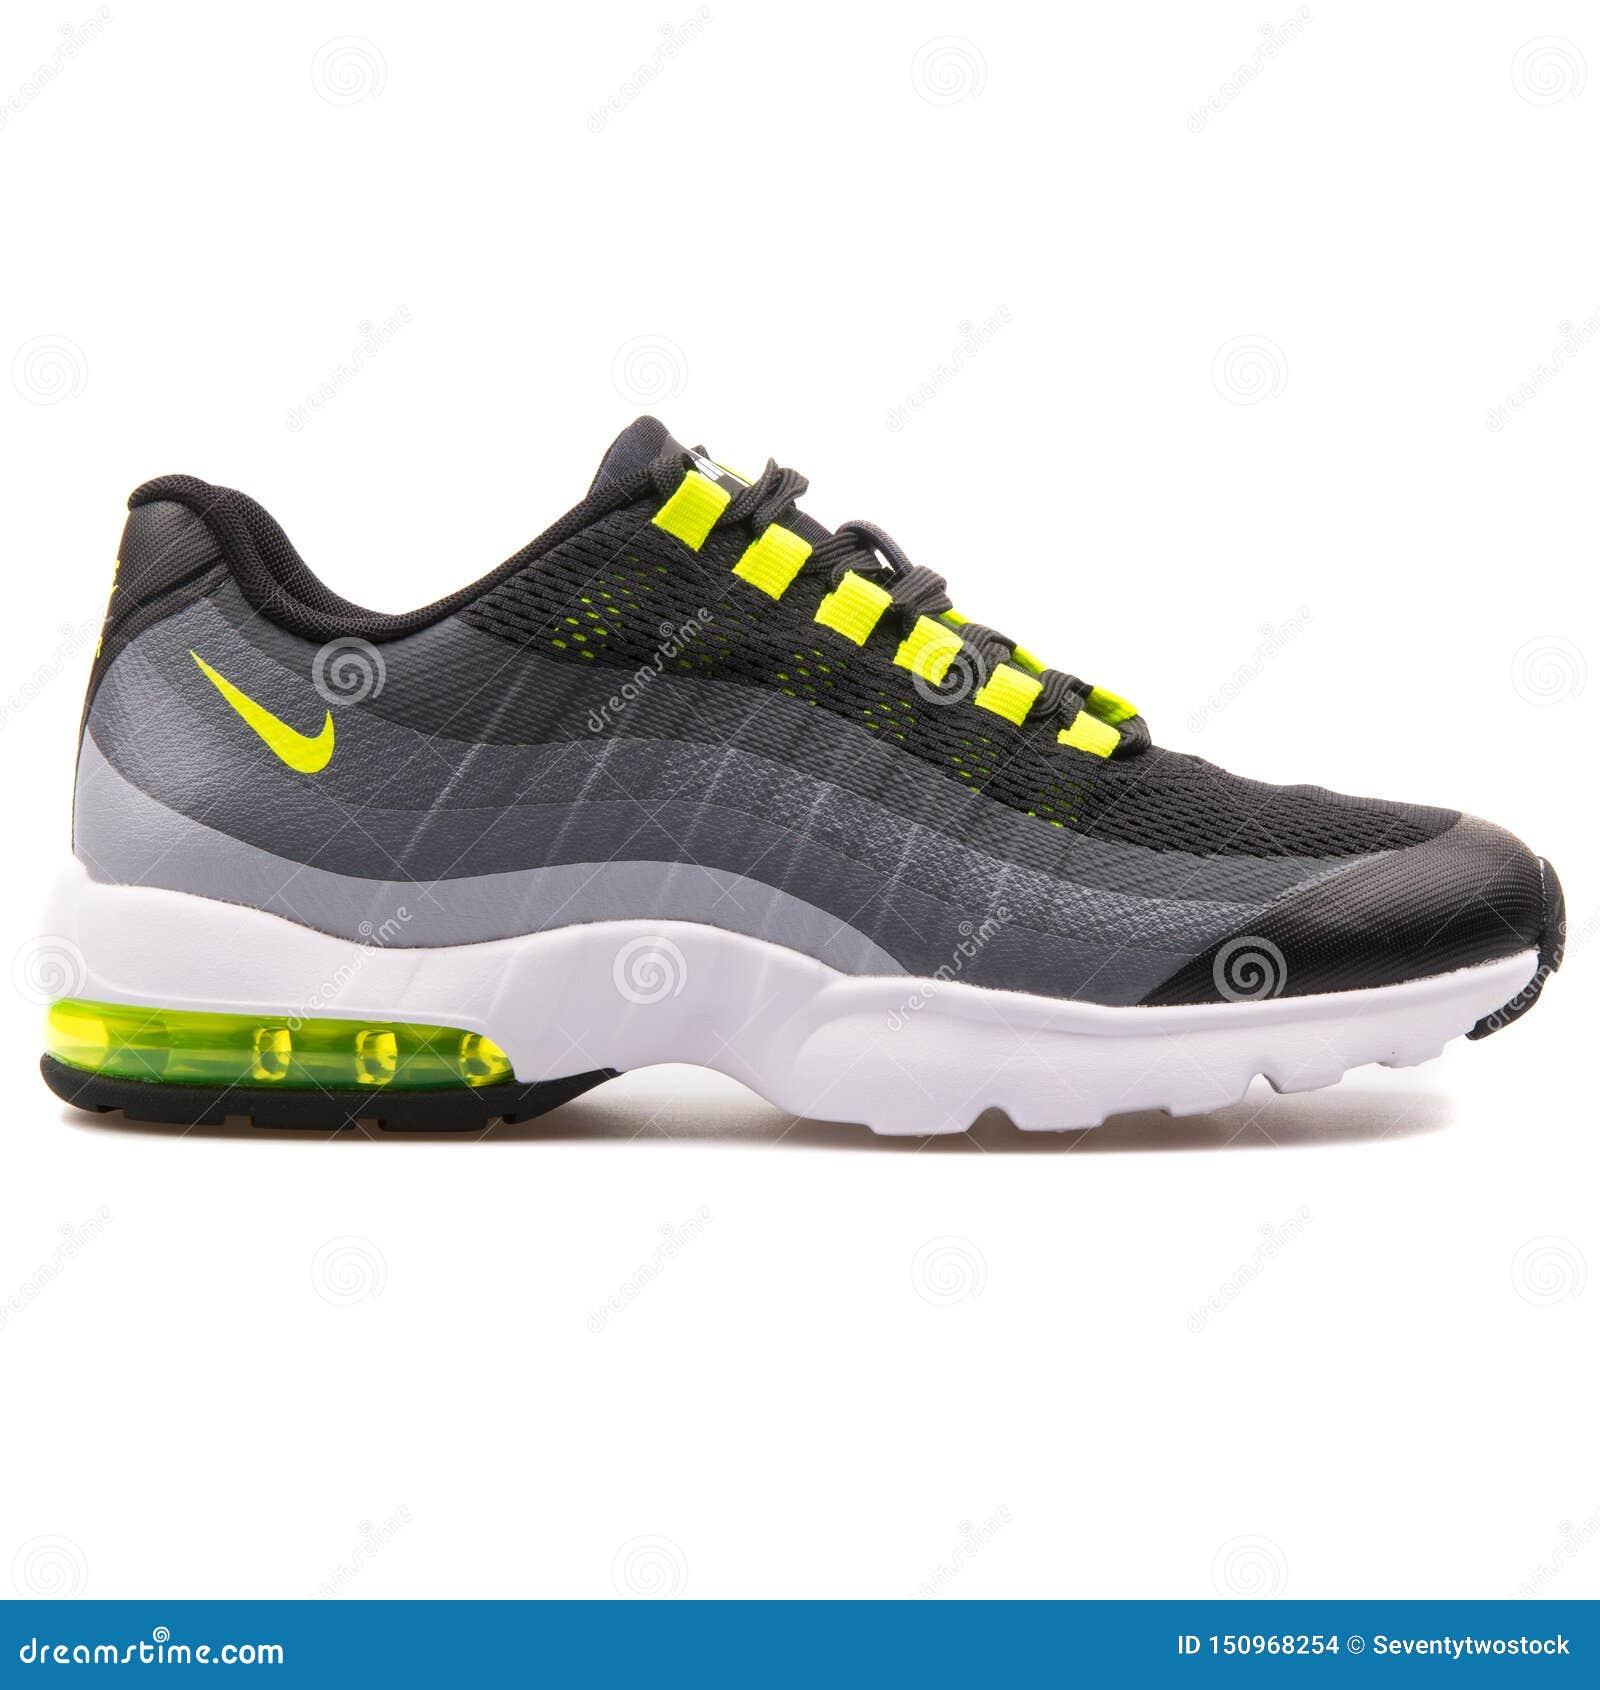 new product 4a35a 5a2de Nike Air Max 95 Ultra Black, Grey And Volt Yellow Sneaker ...